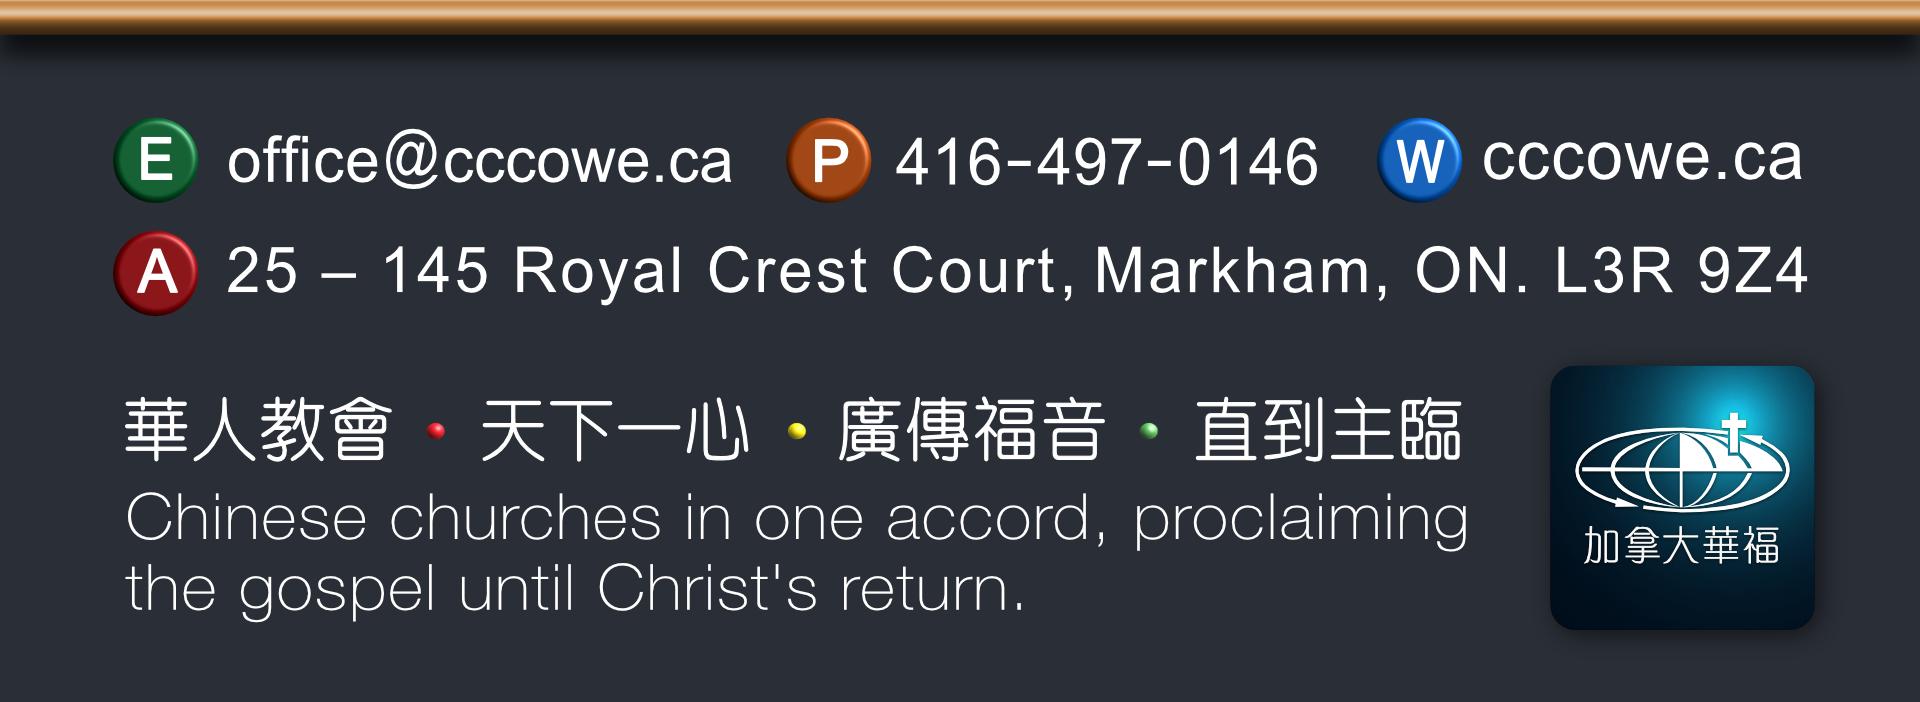 CCCOWE Canada Information